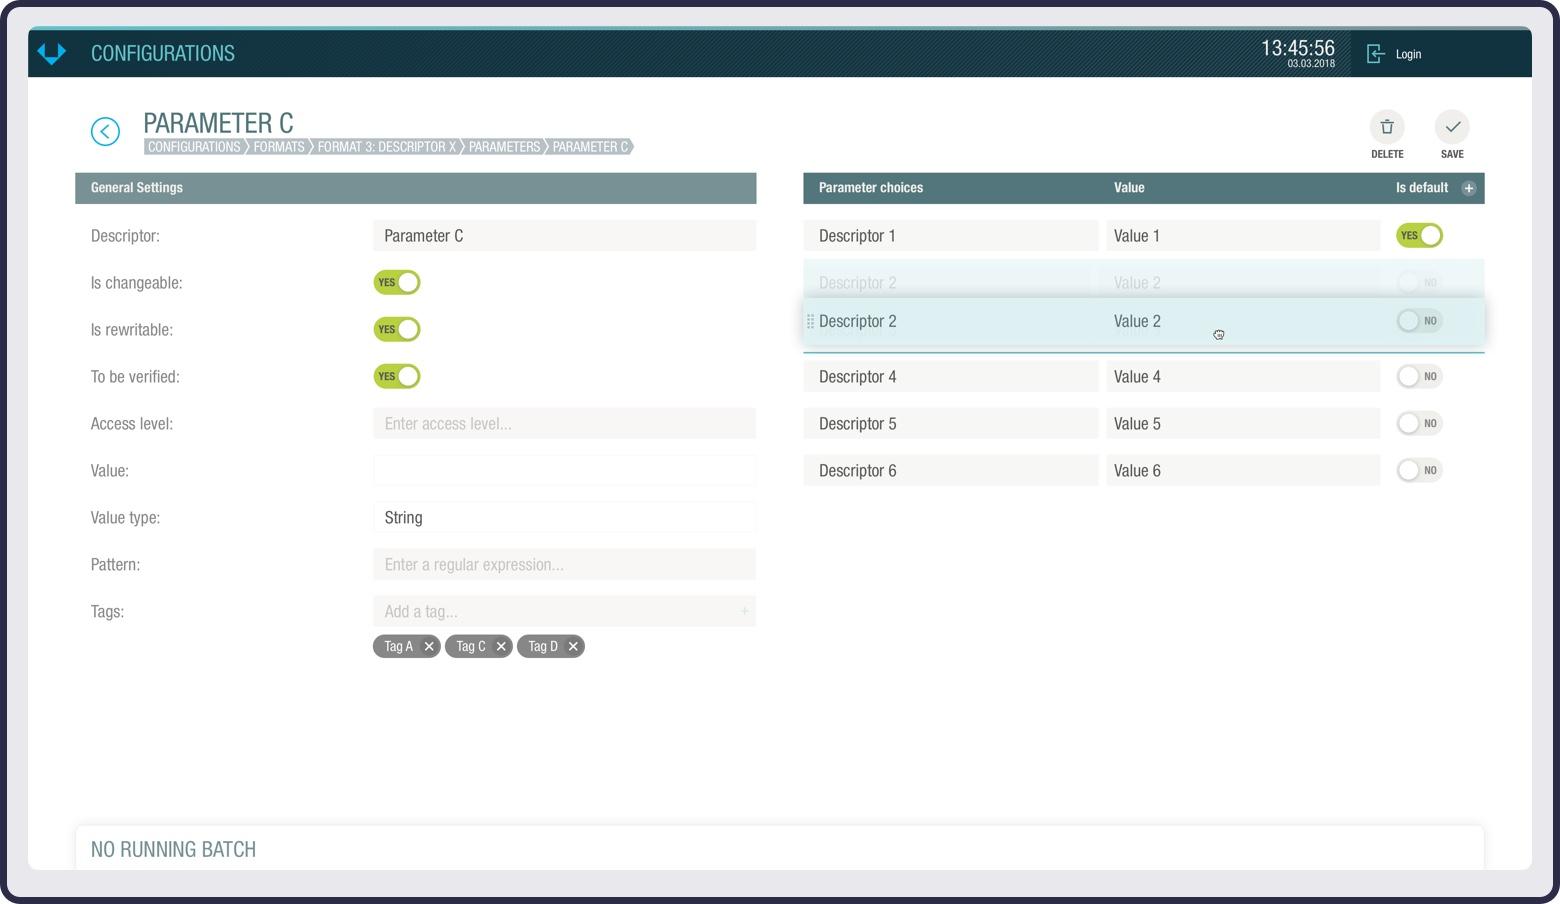 Configurator screenshot of parameter details